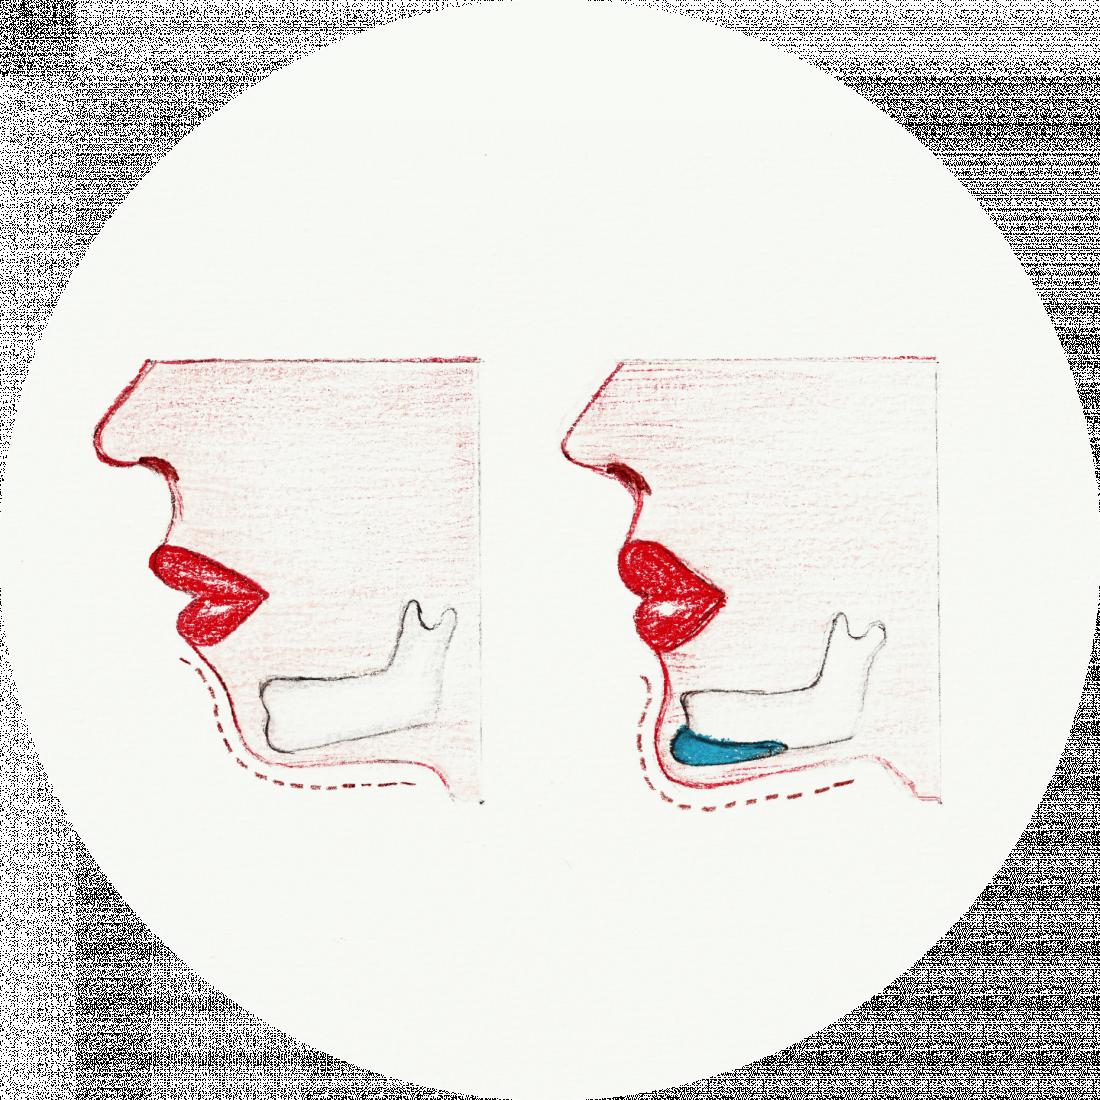 Procedure details : Chin Implant